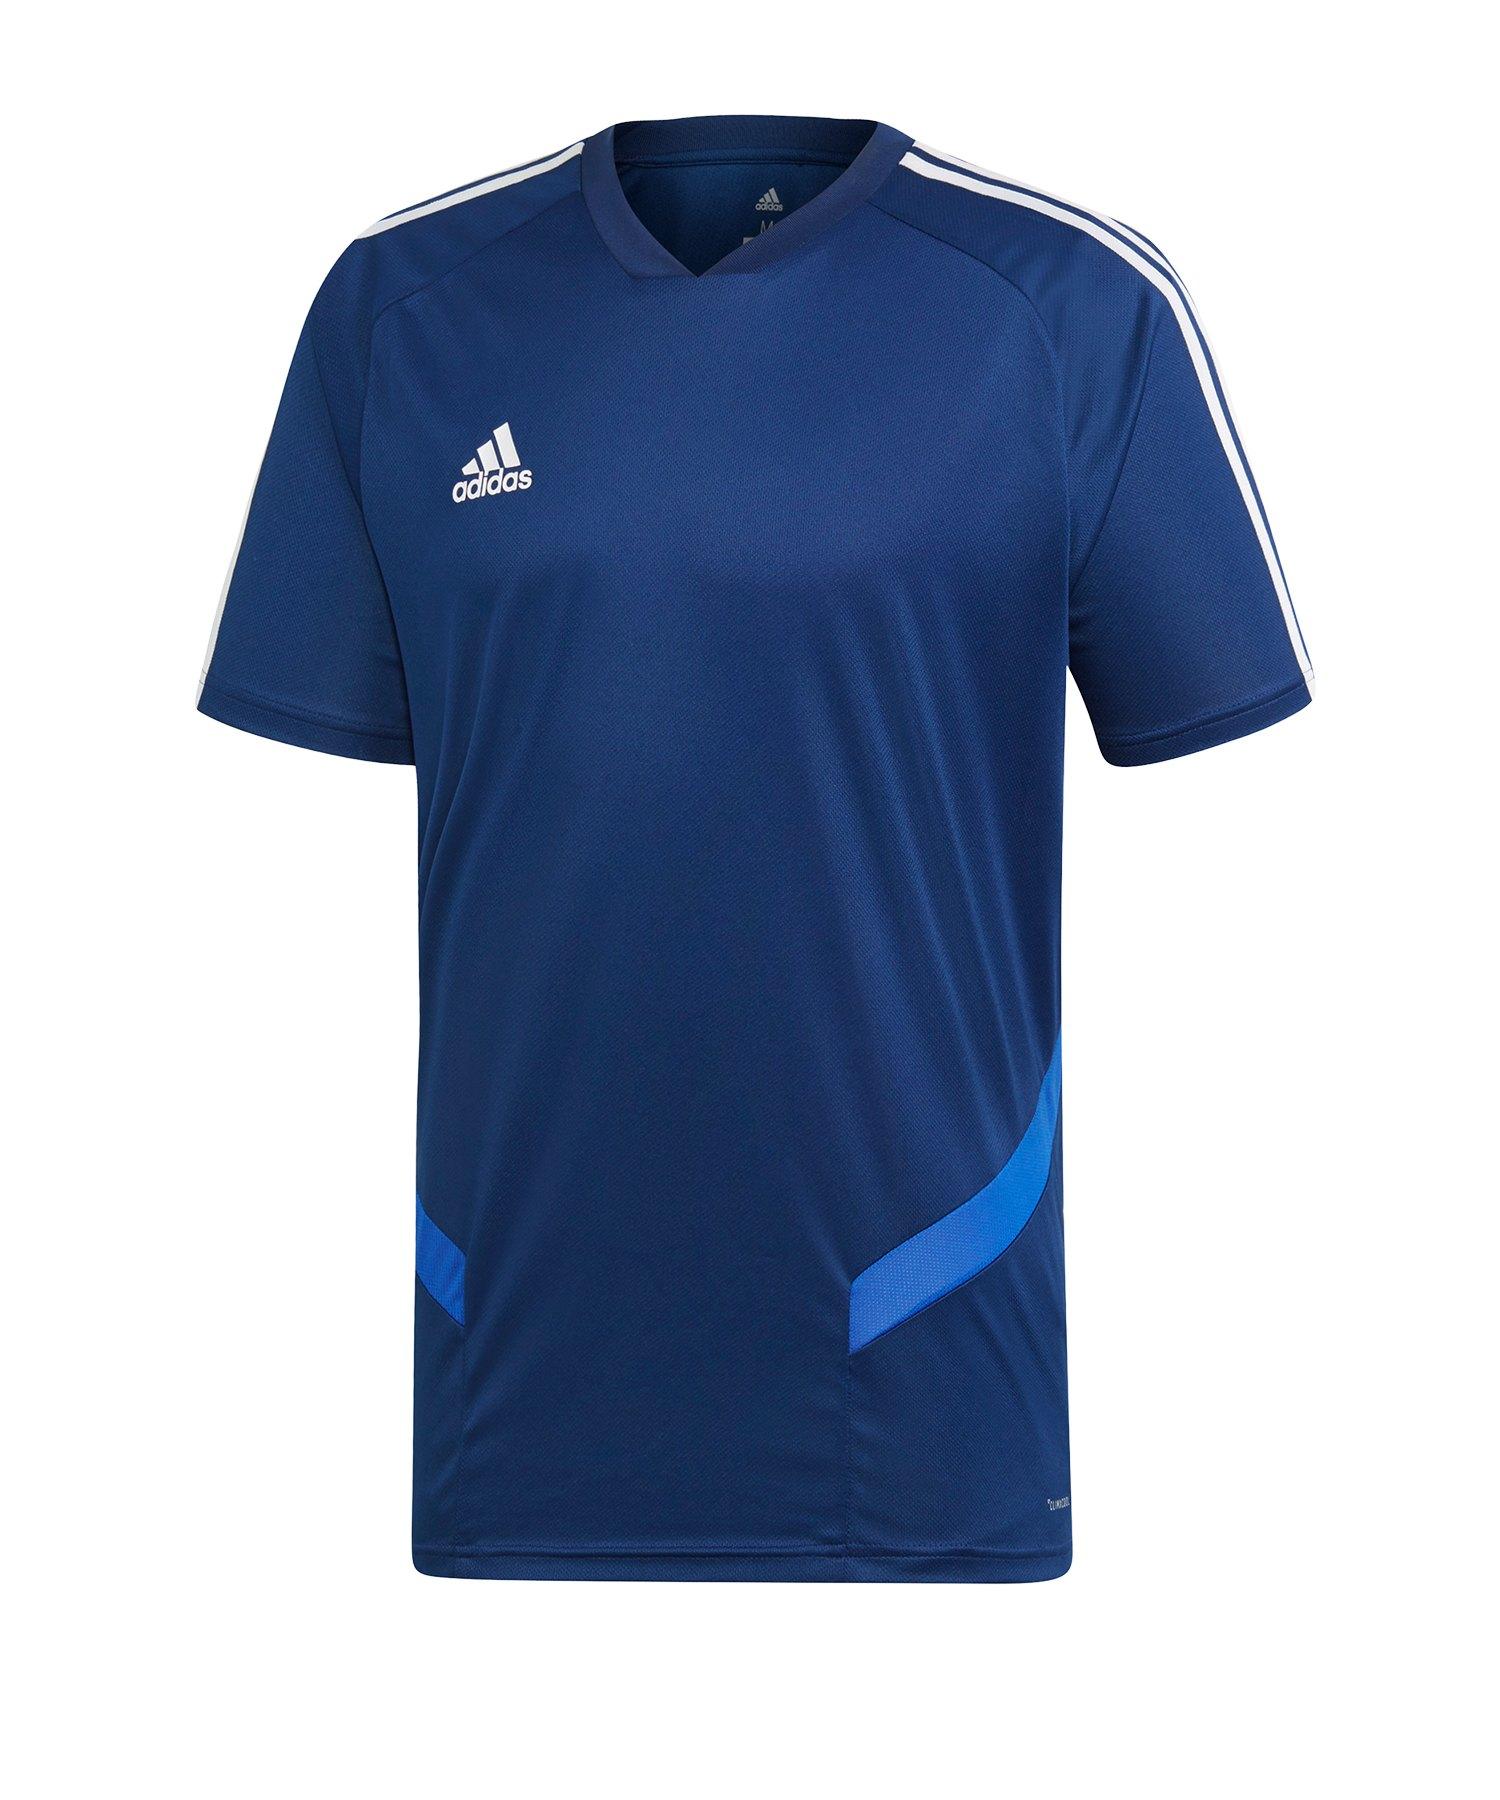 adidas Tiro 19 Trainingsshirt Dunkelblau Weiss - blau